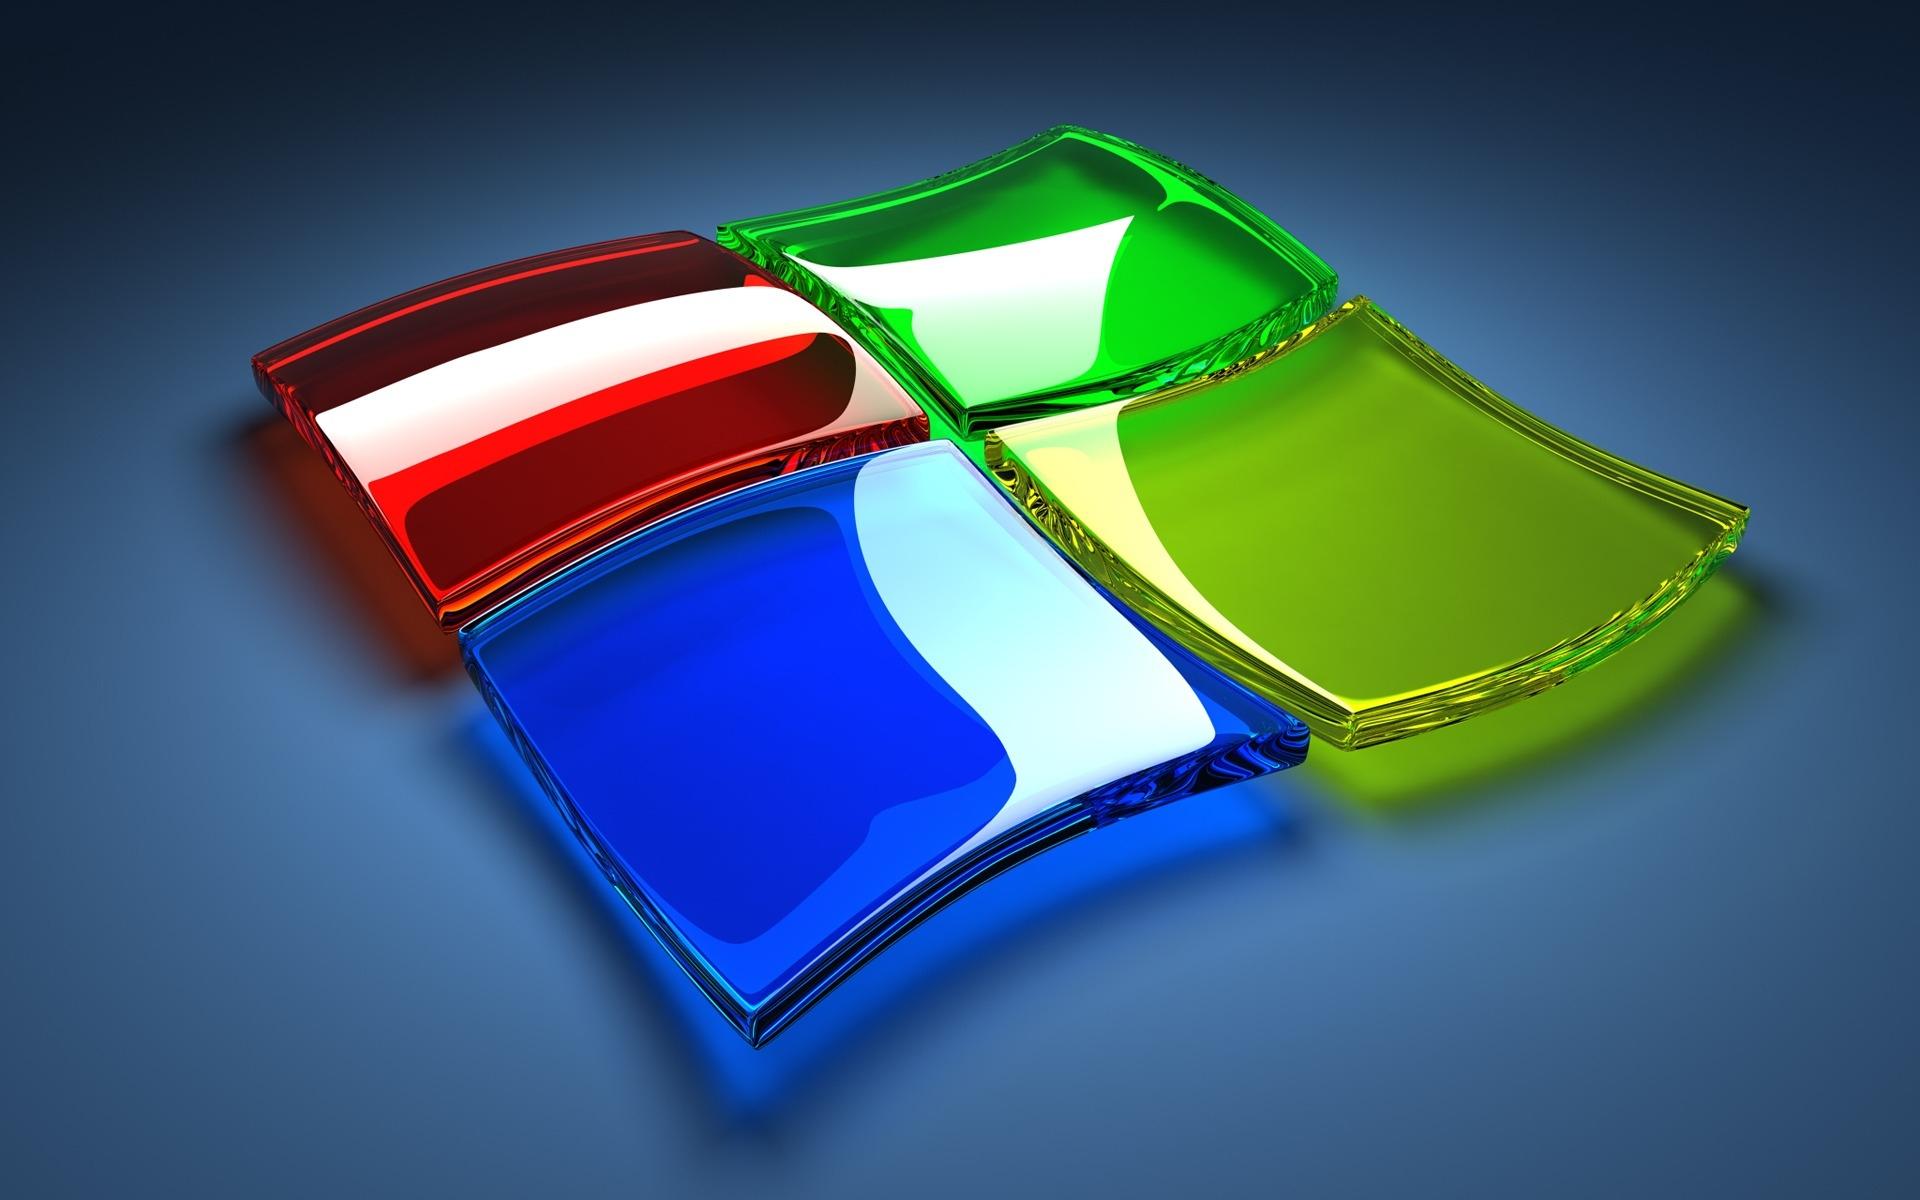 hd windows logo desktop backgrounds share this cool desktop background 1920x1200